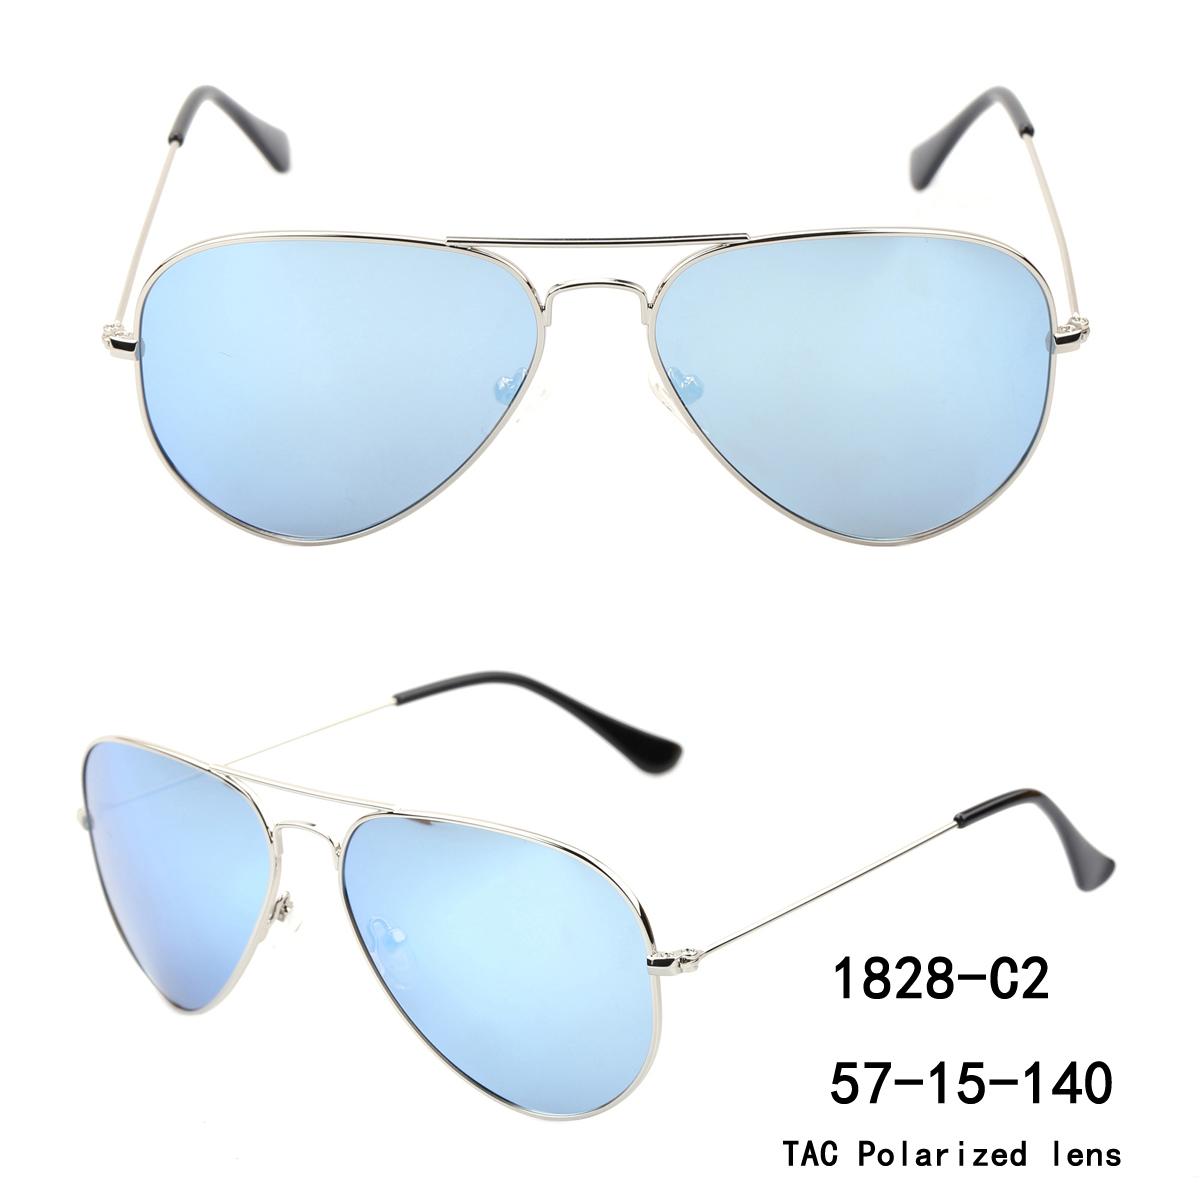 400 Uv Protection Aviator Sunglasses,Oversized Metal Frame Men Polarized Sunglasses Oem Odm